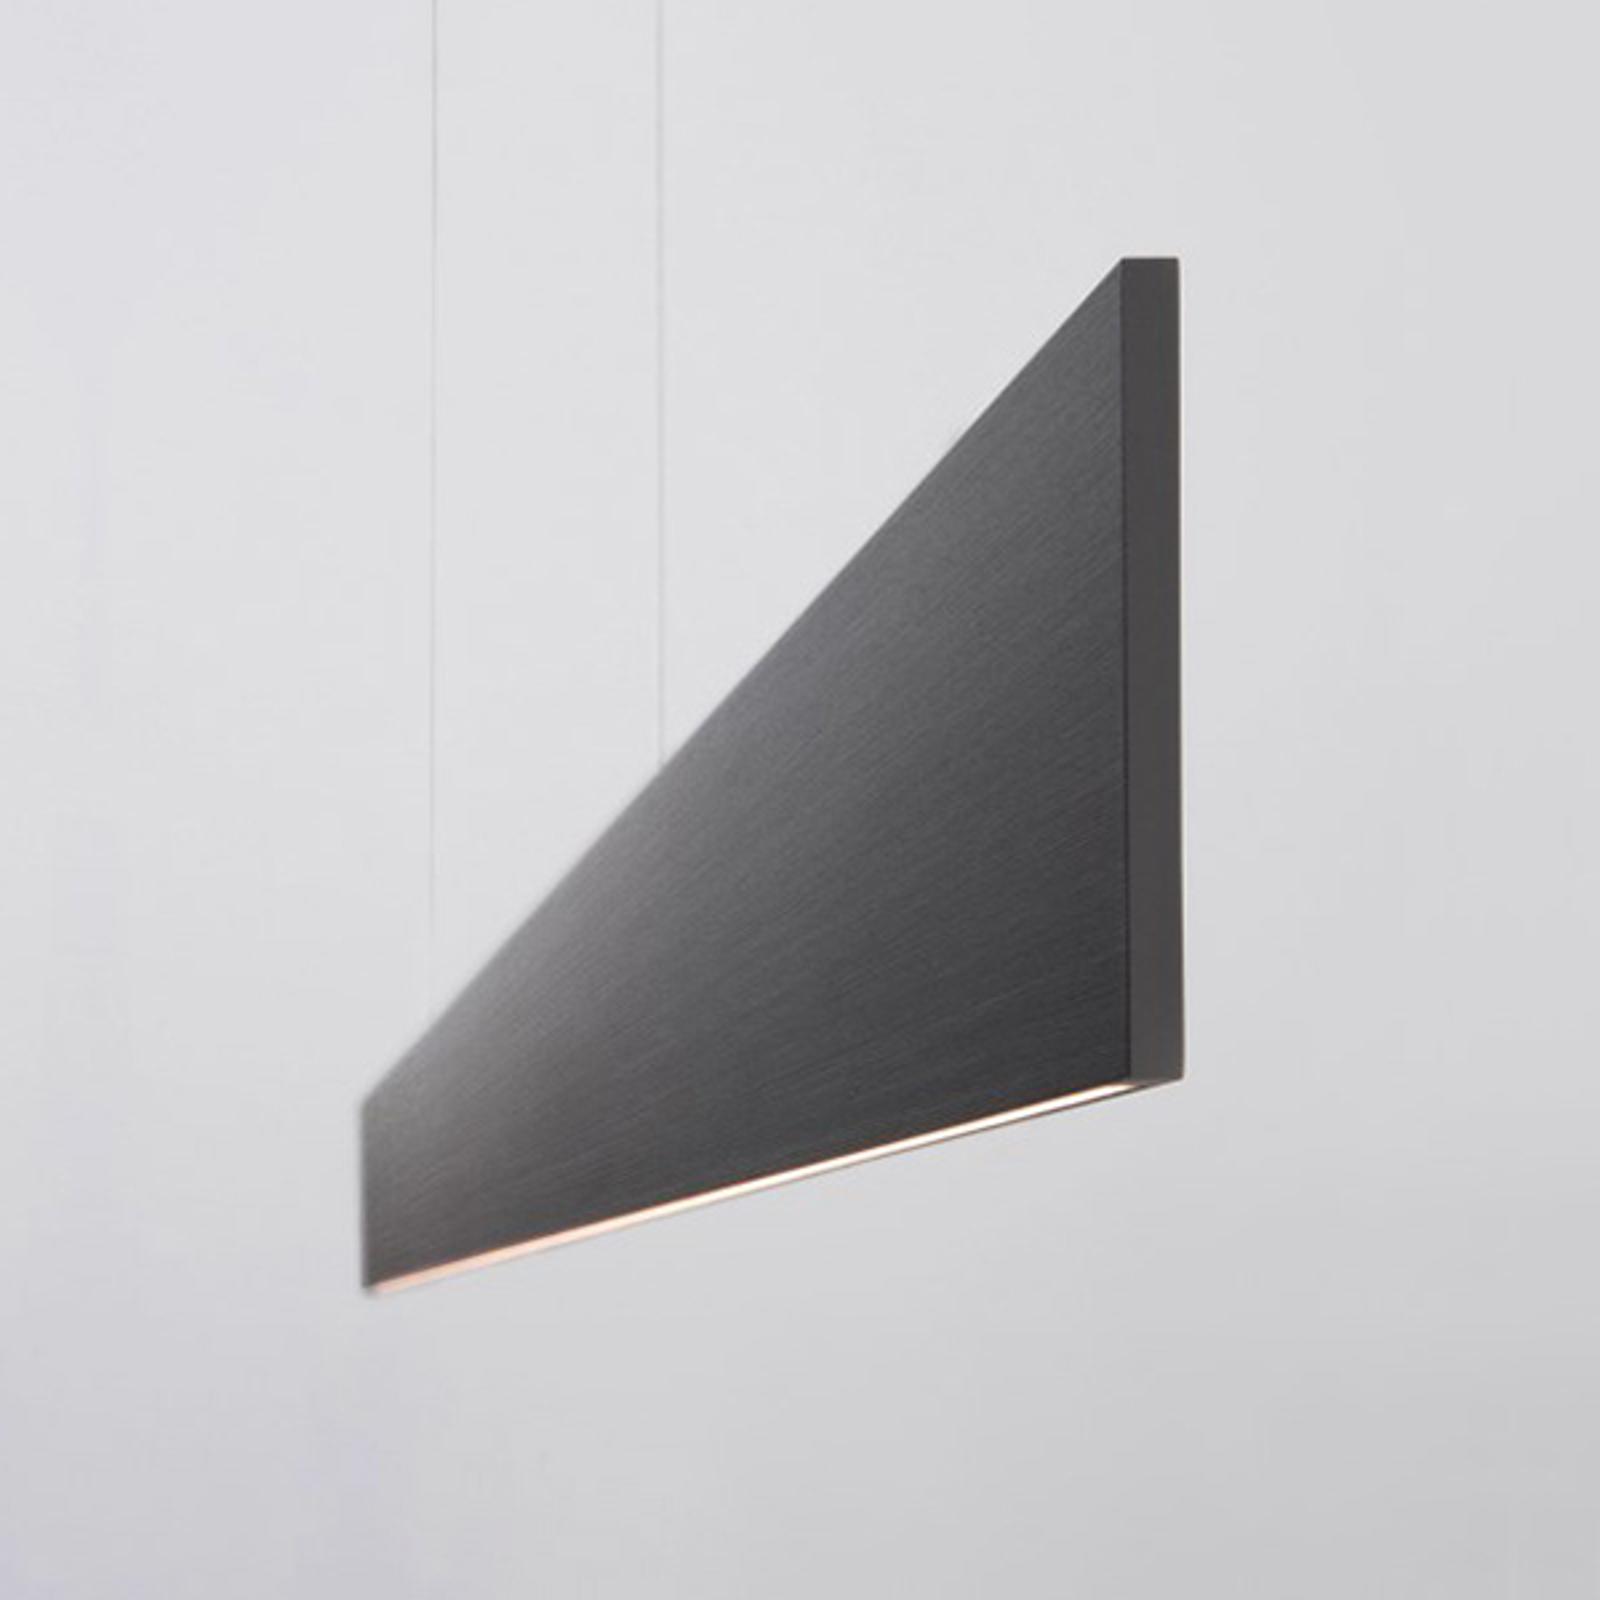 Lampa wisząca LED After 8 122cm 1-10V grafitowa